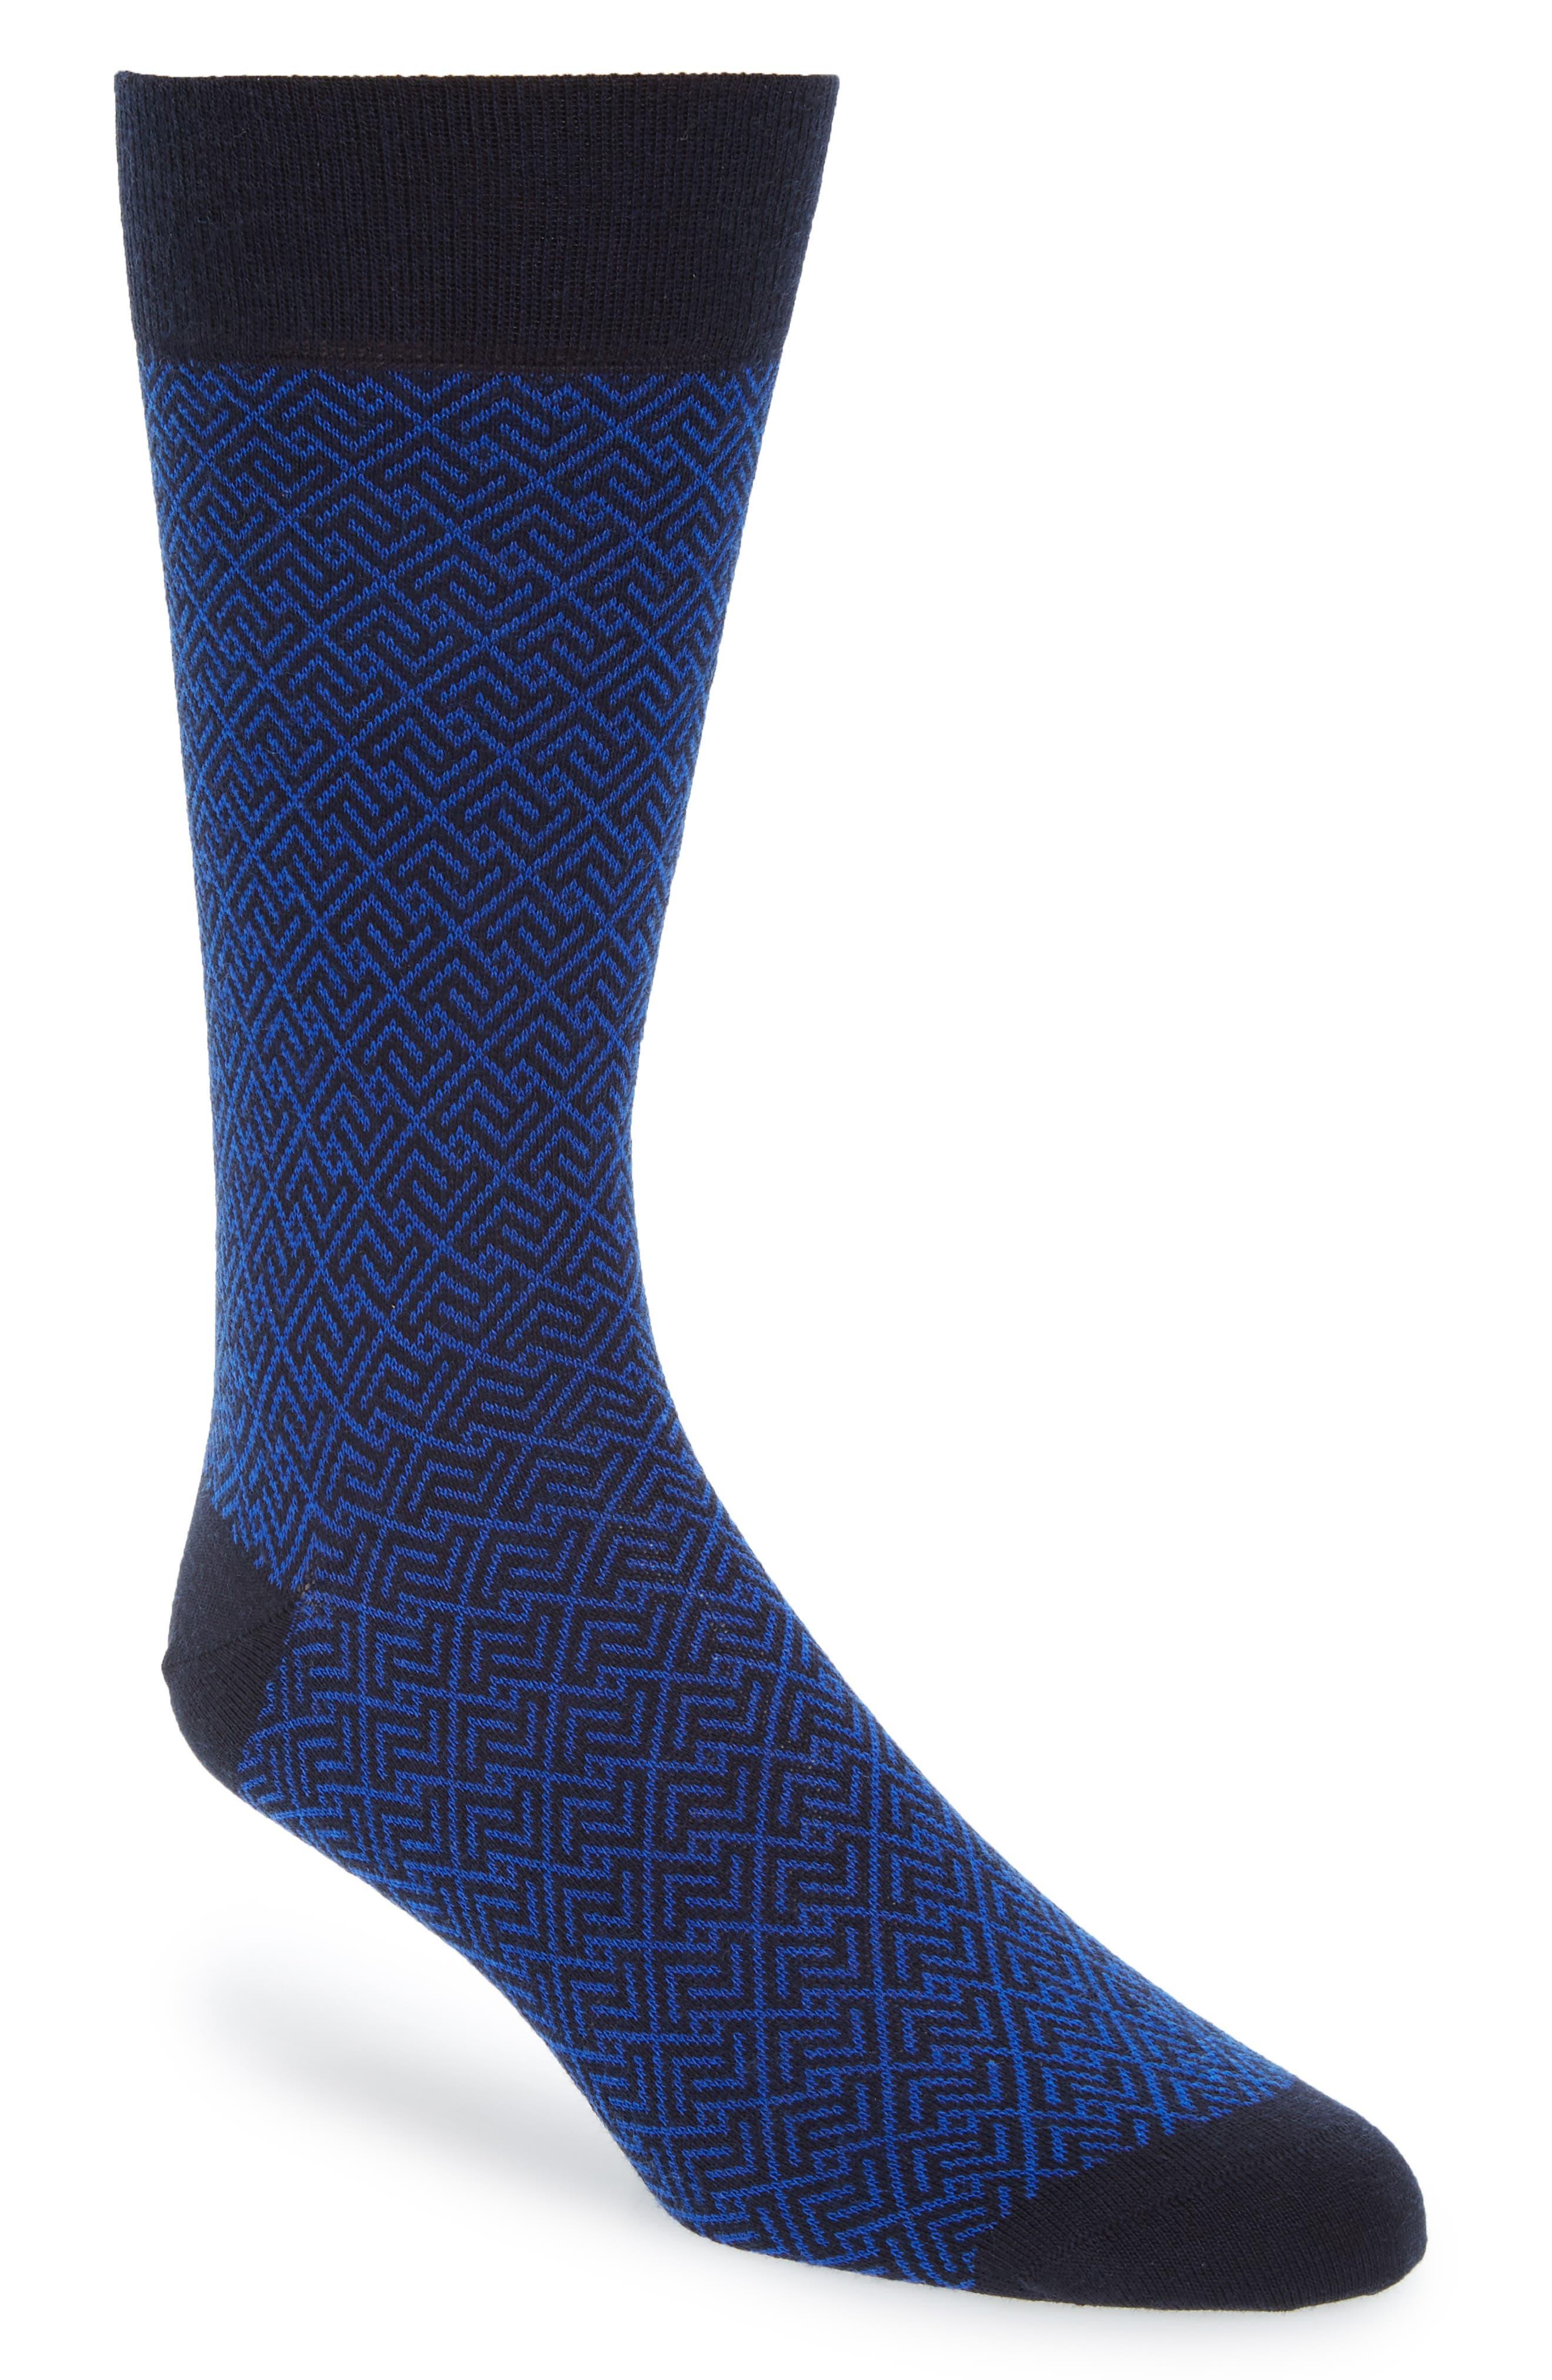 History of Vintage Men's Socks -1900 to 1960s Mens Pantherella Retro Jacquard Socks $17.98 AT vintagedancer.com